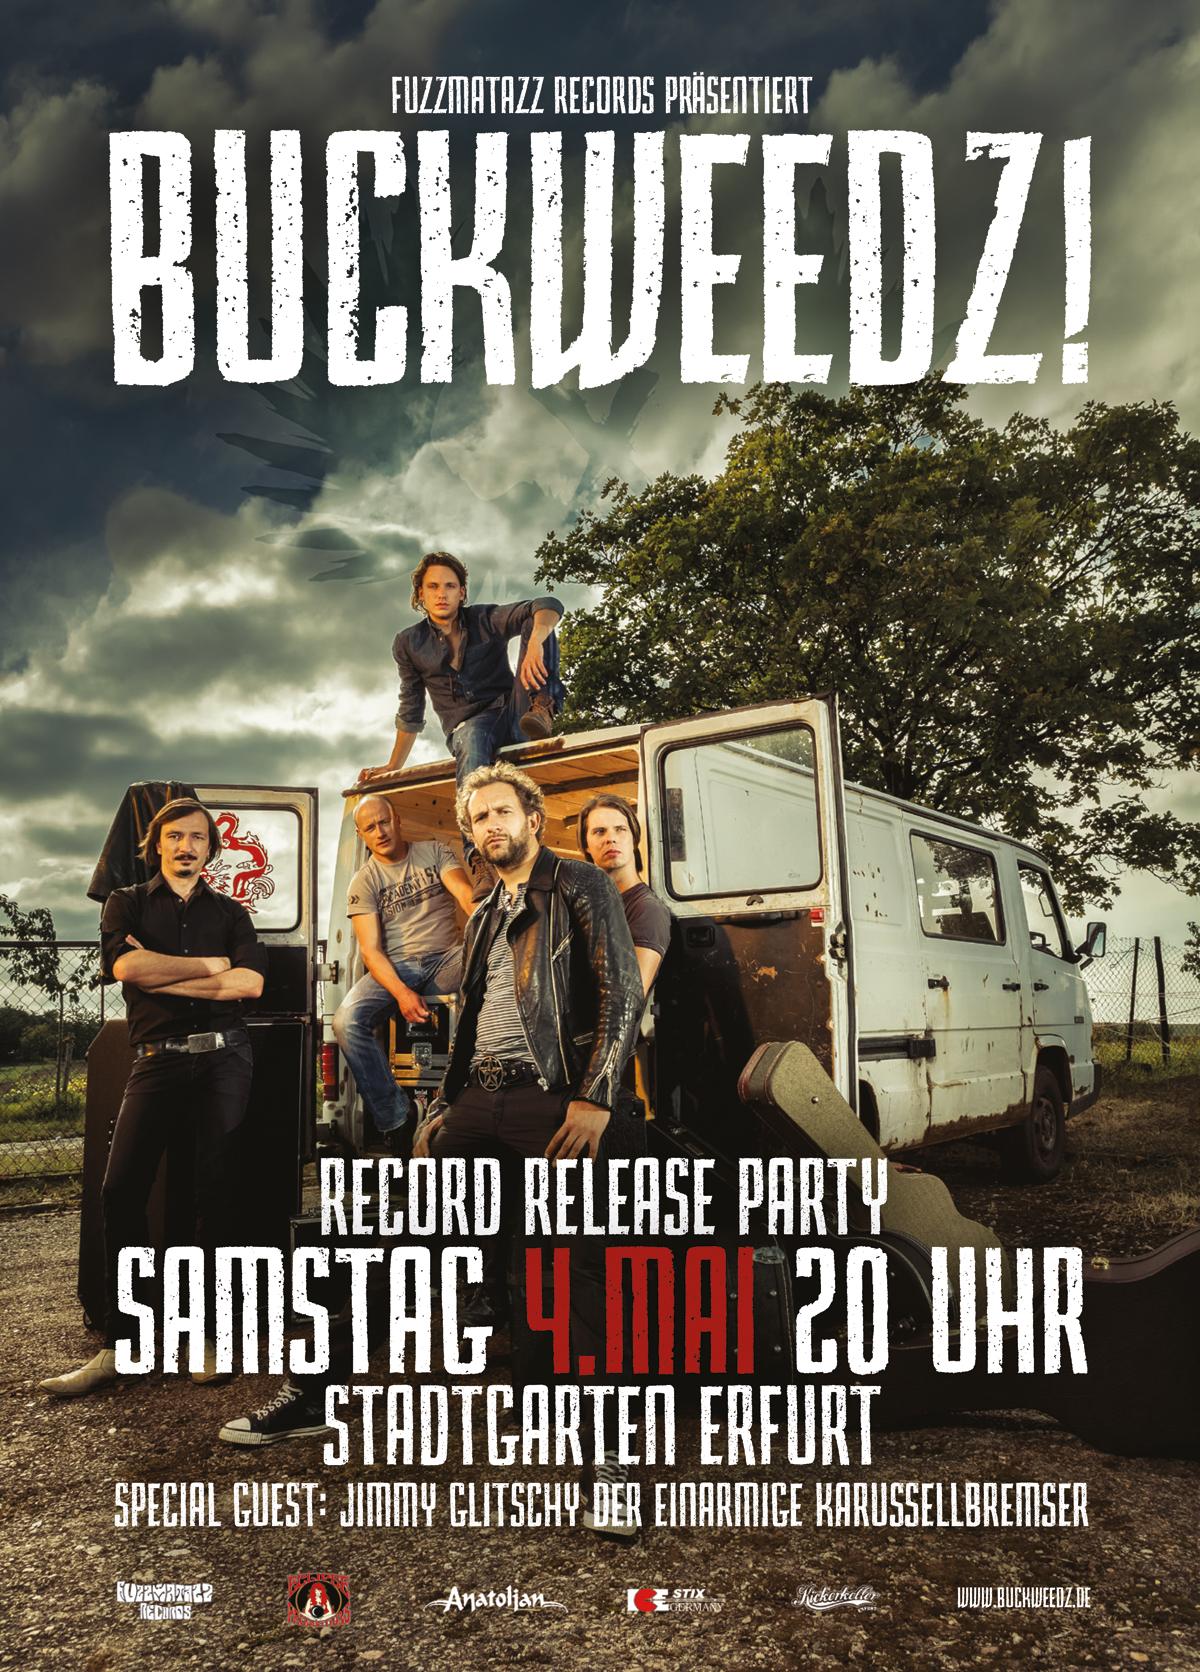 flyer-release